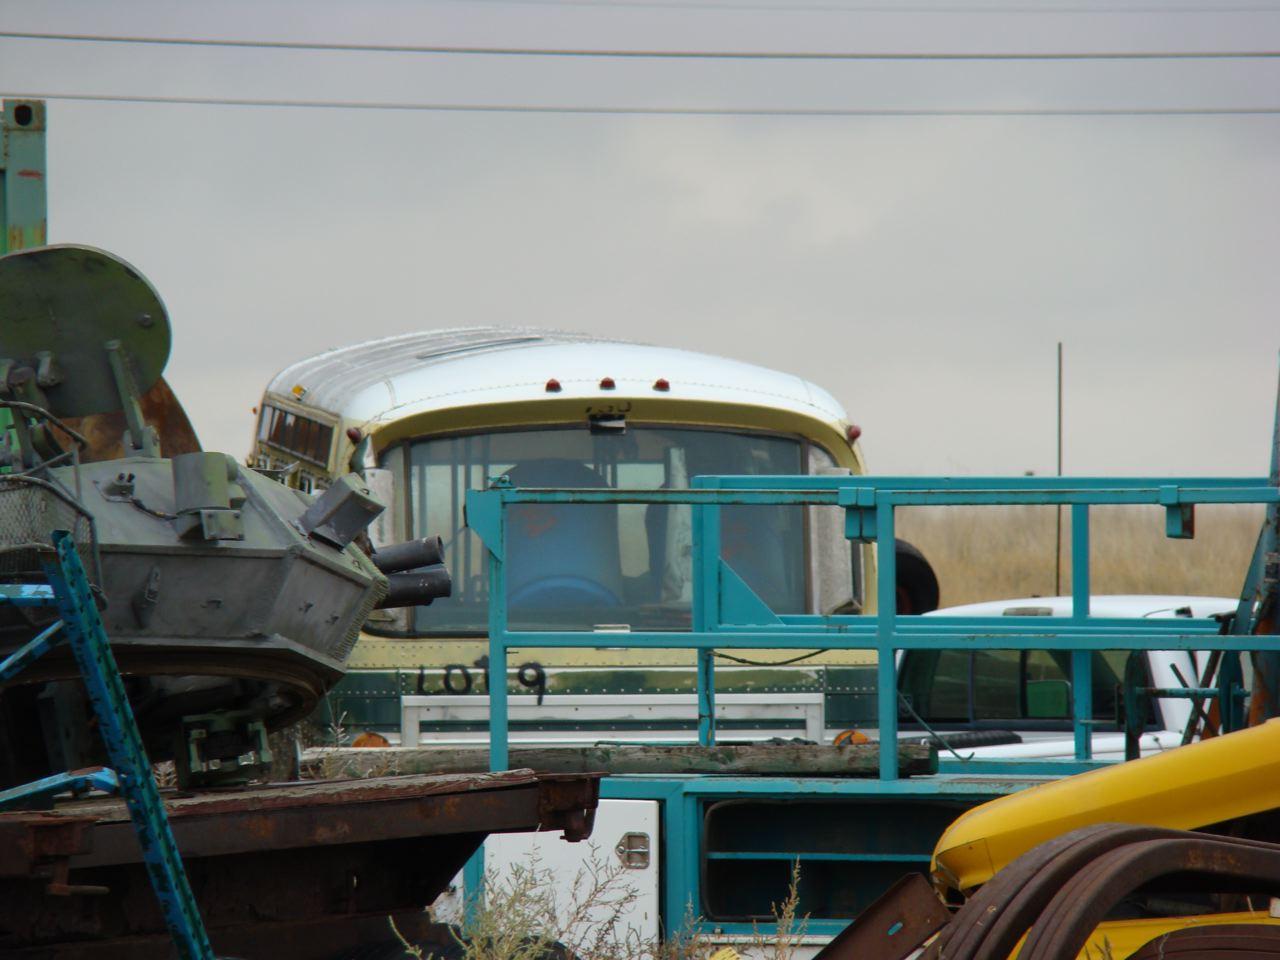 MH_750_rear.jpg